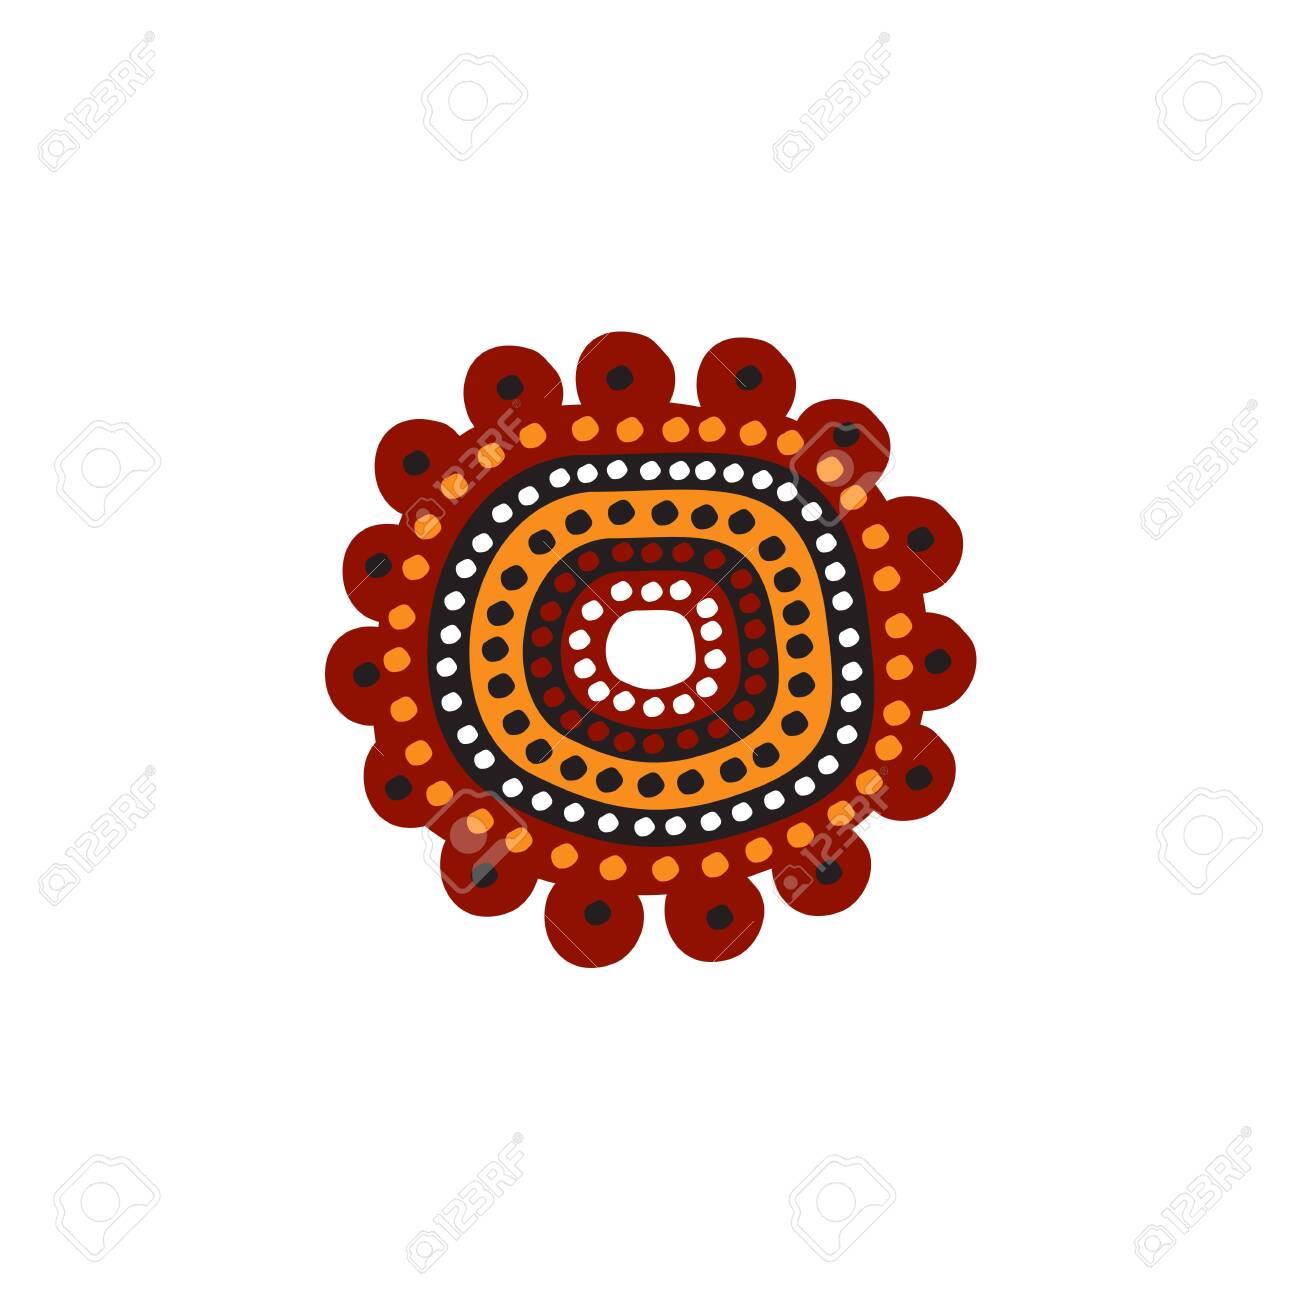 Aboriginal art icon design vector template - 125043878